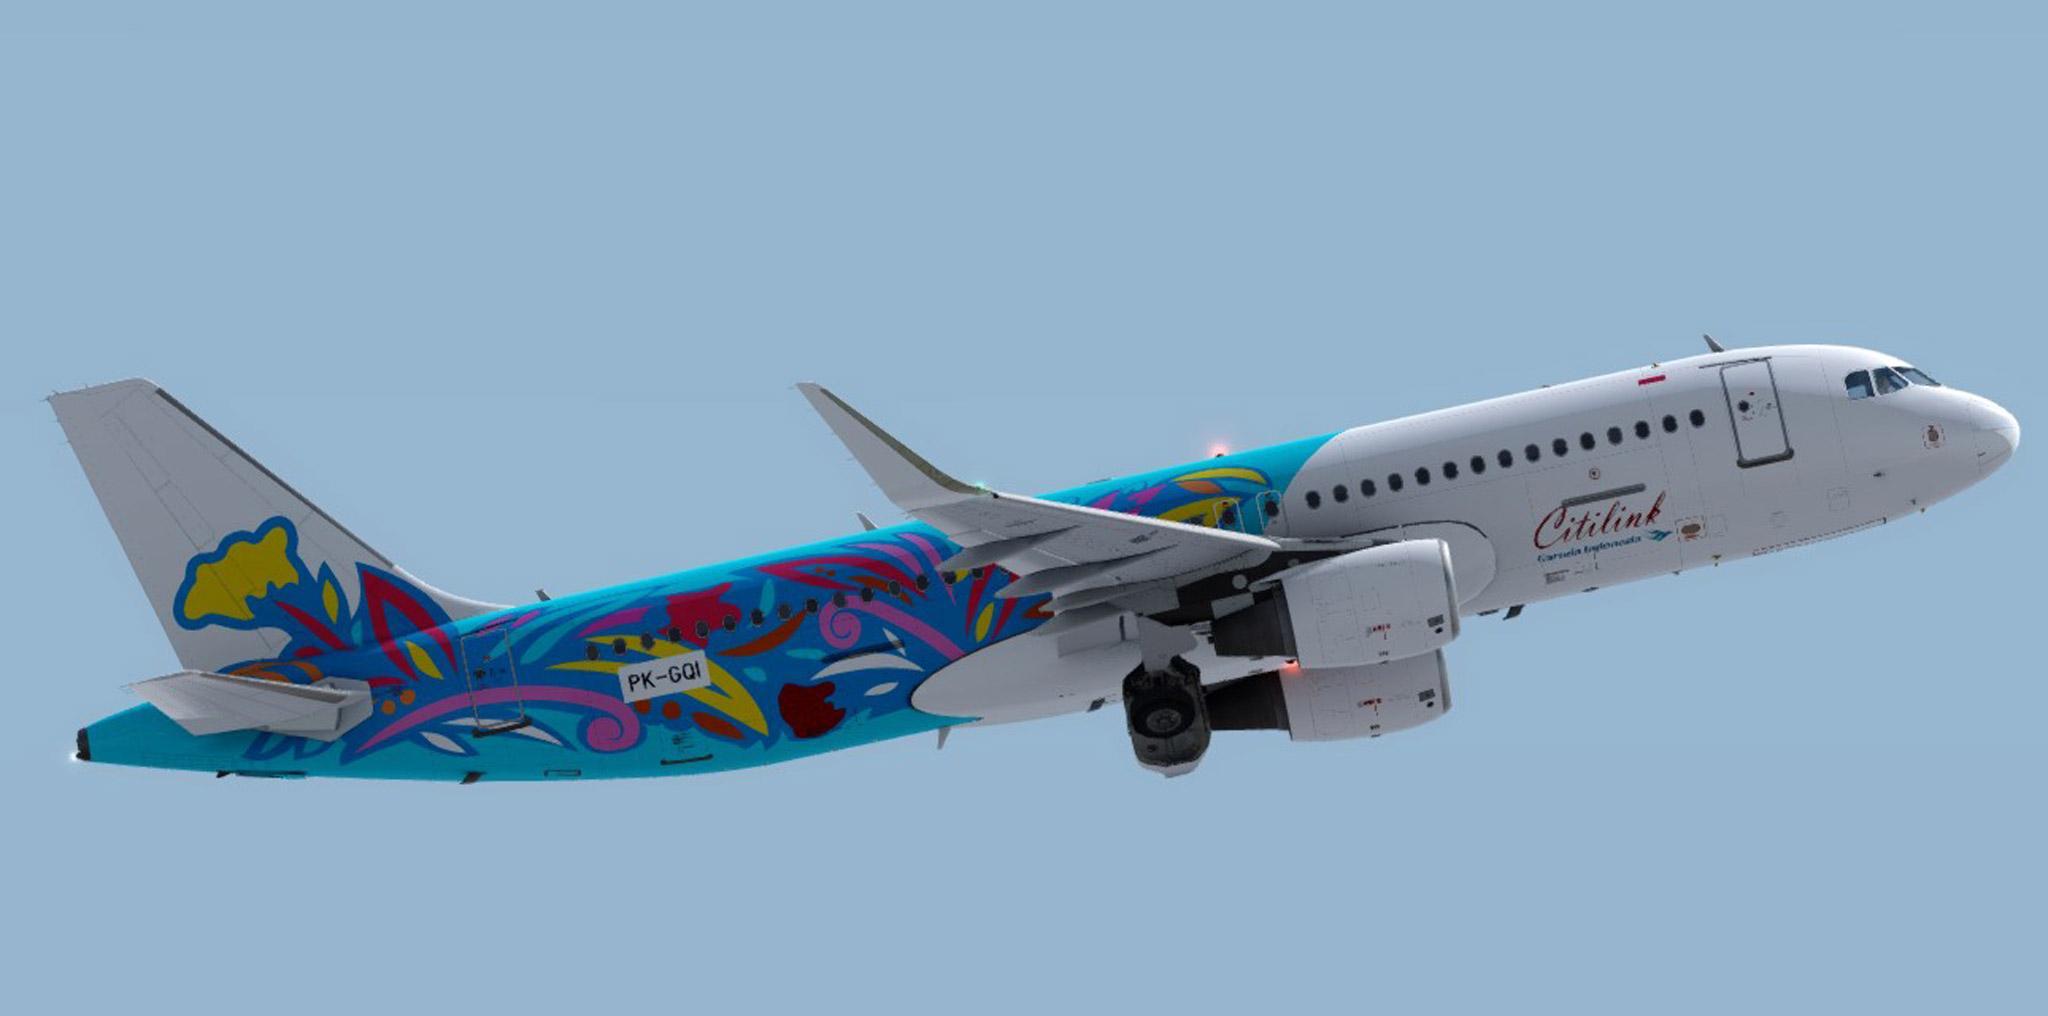 Aerosoft A320 Citilink PK-GQI